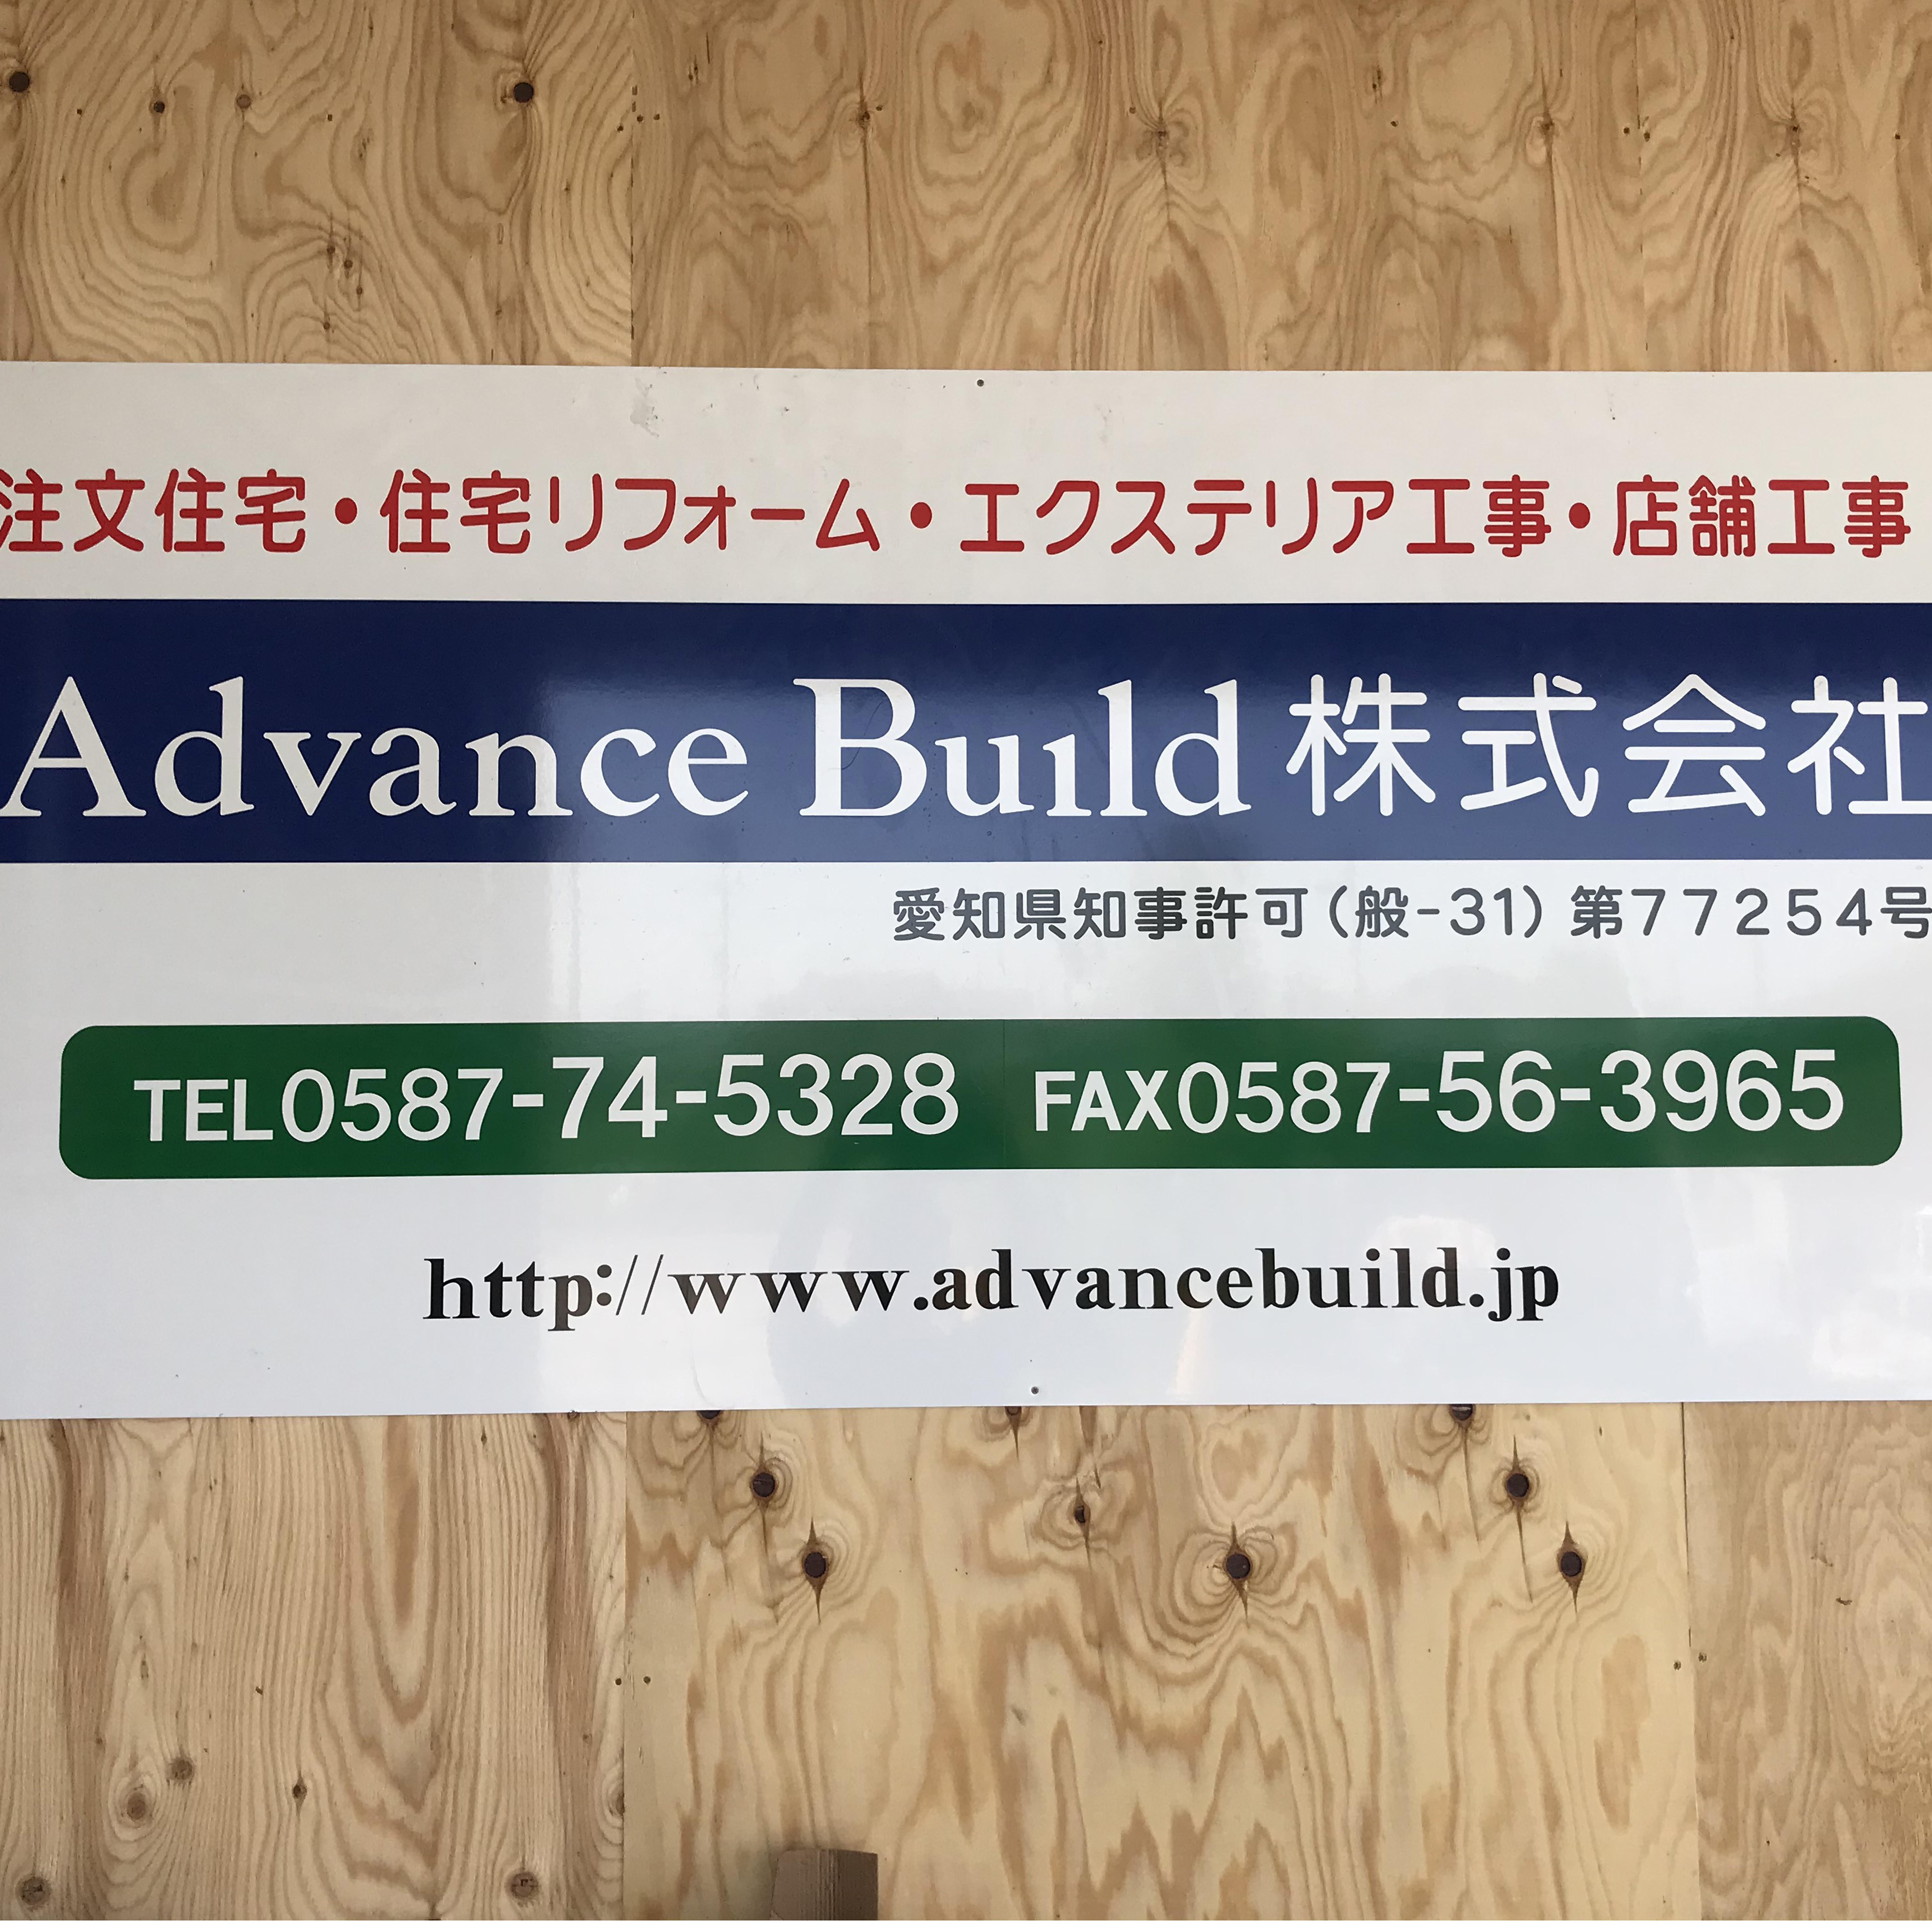 Advance Build株式会社